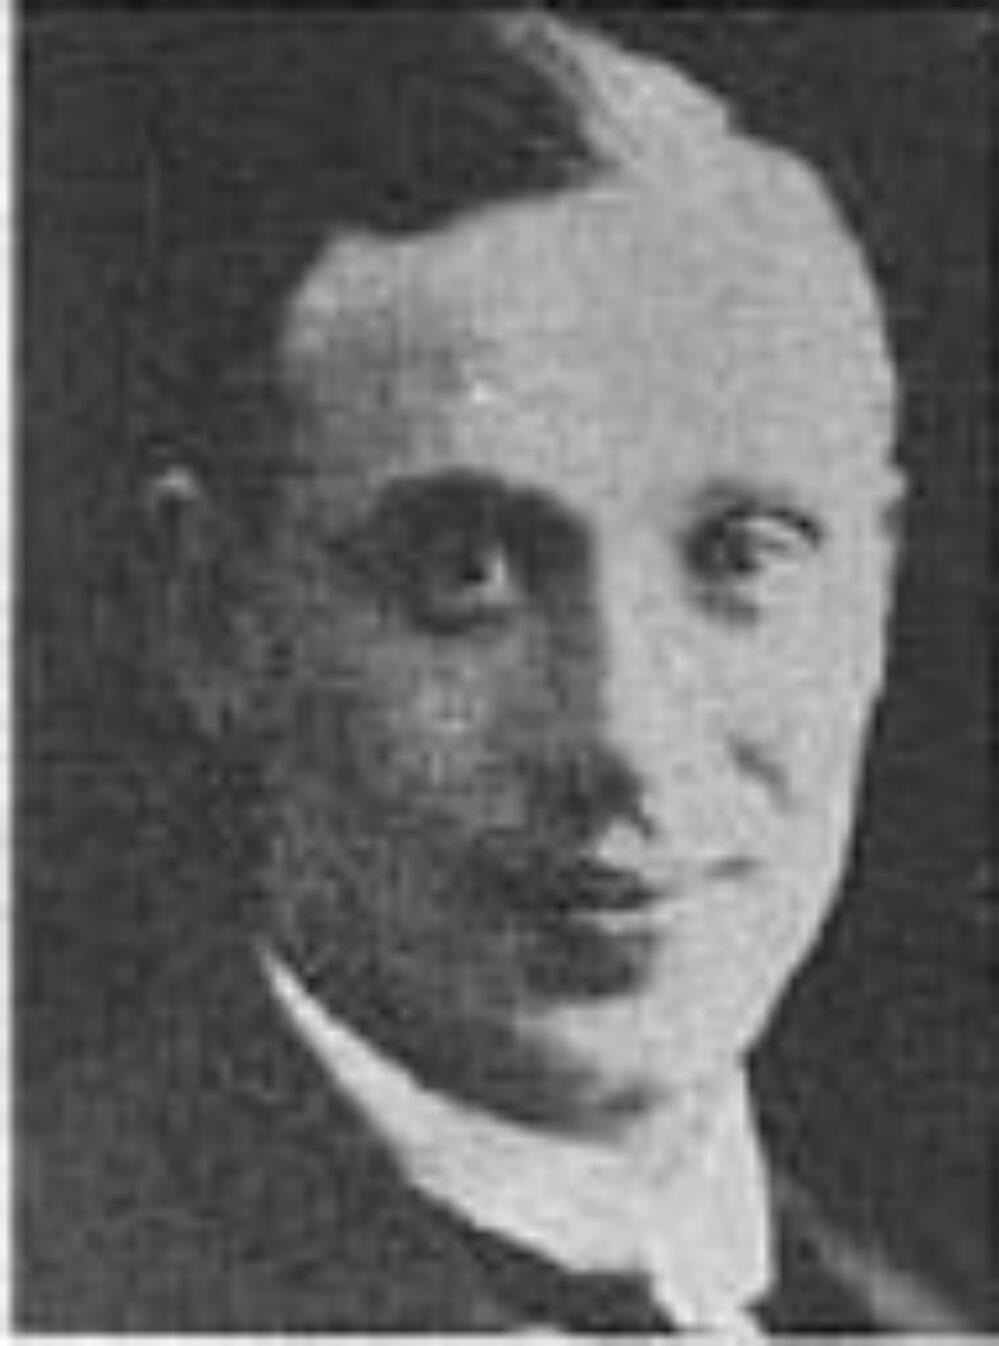 Lorentz Johan Tvedt